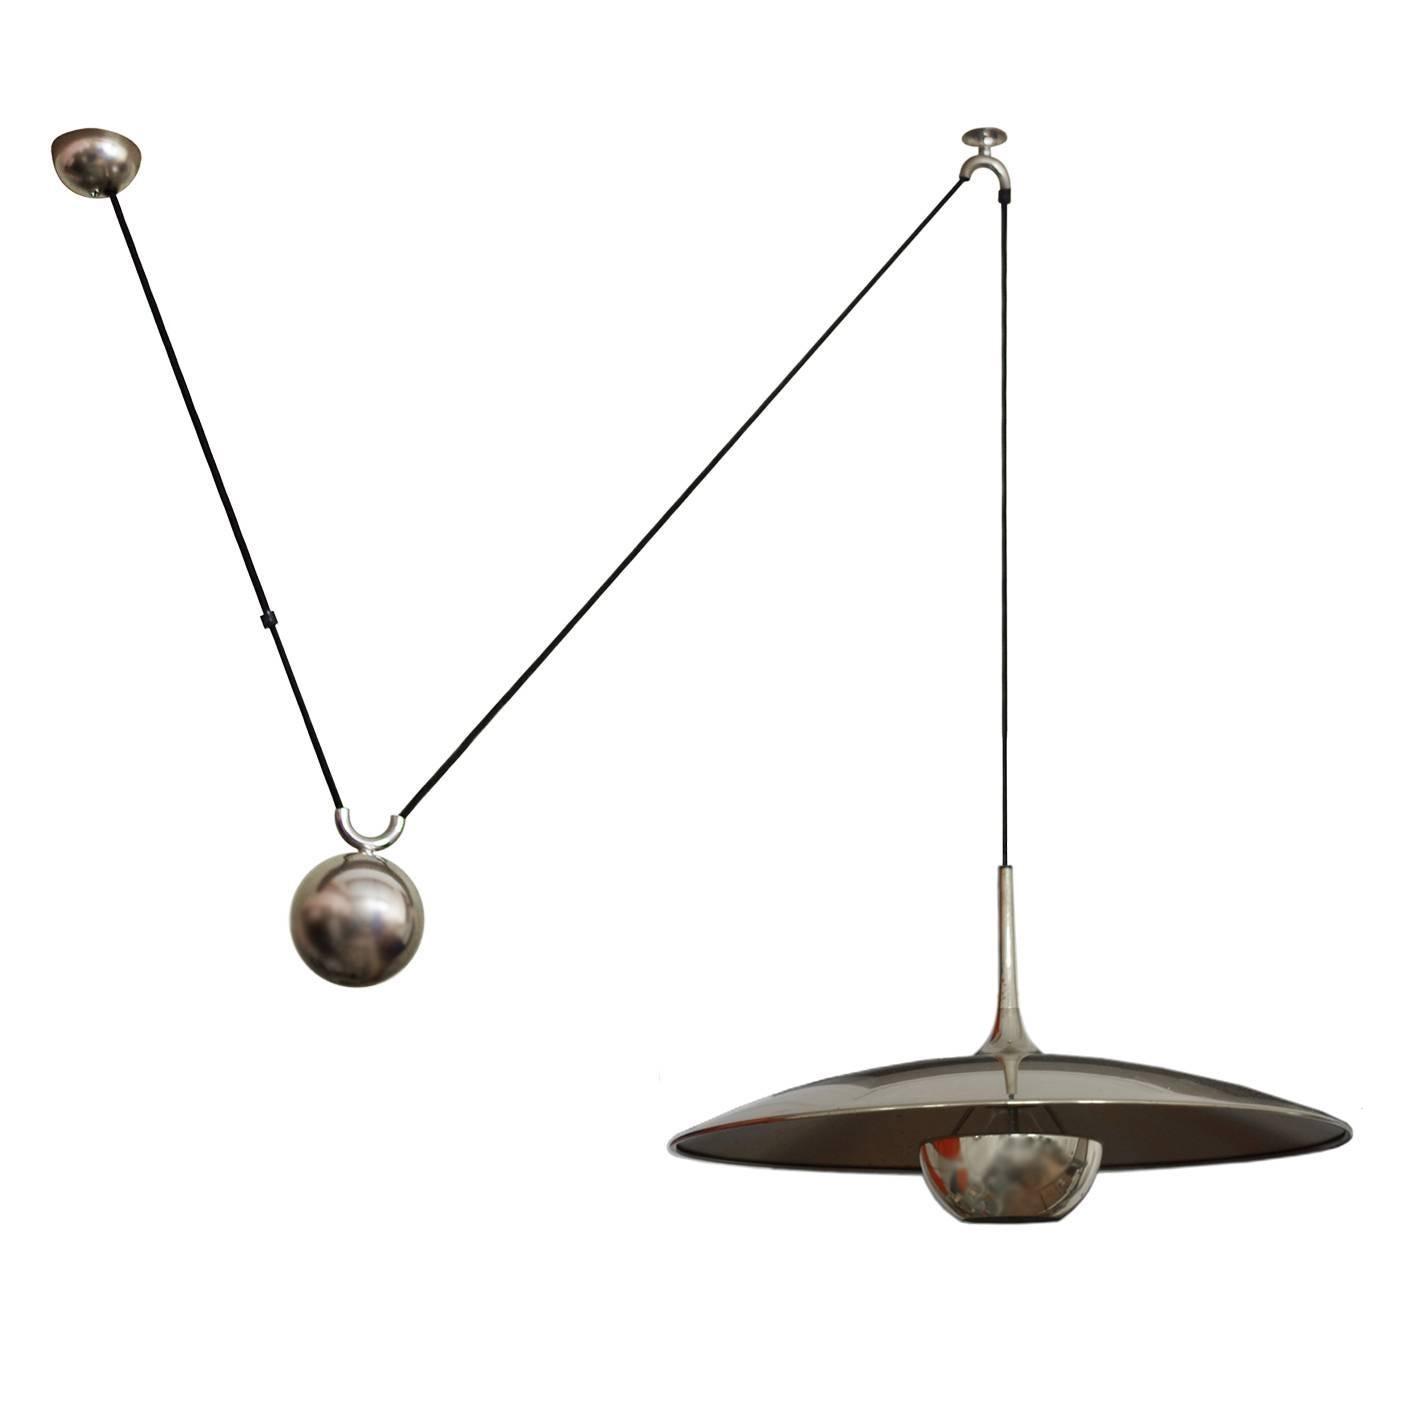 German Large Vintage Adjustable Counterweight Pendant Lamp by Florian Schulz